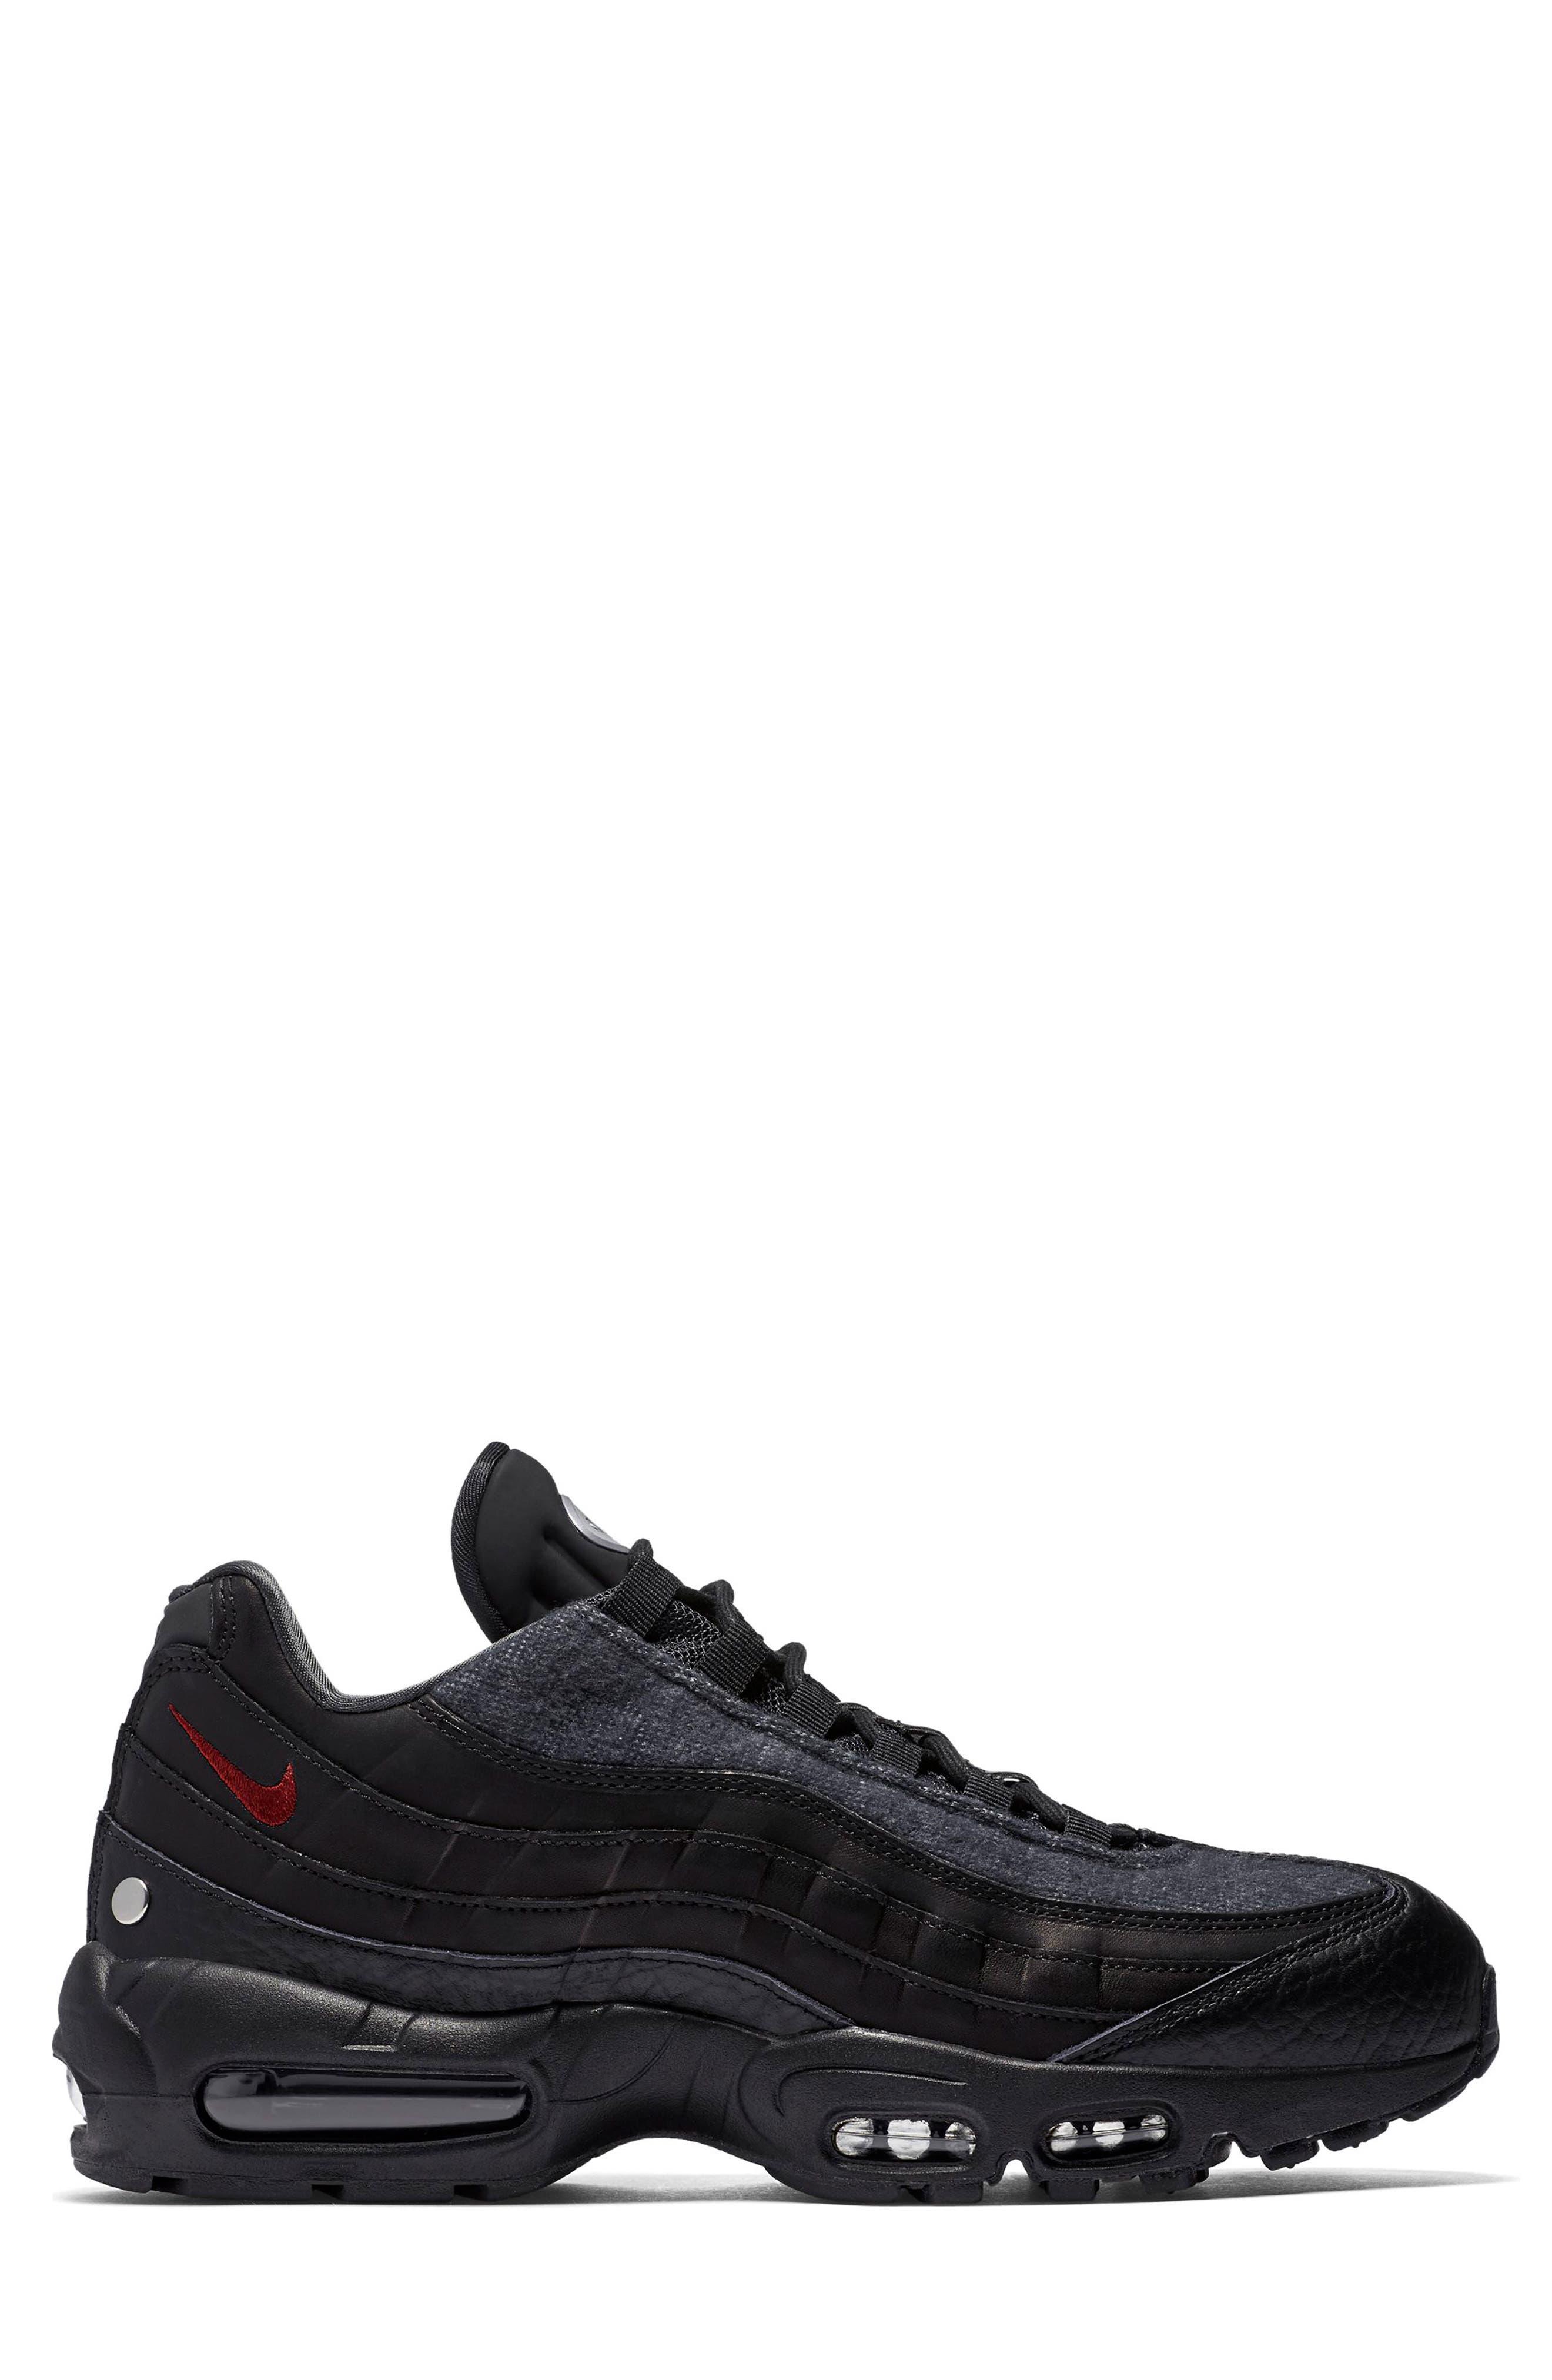 Air Max 95 NRG Sneaker,                             Alternate thumbnail 3, color,                             BLACK/ TEAM RED/ ANTHRACITE